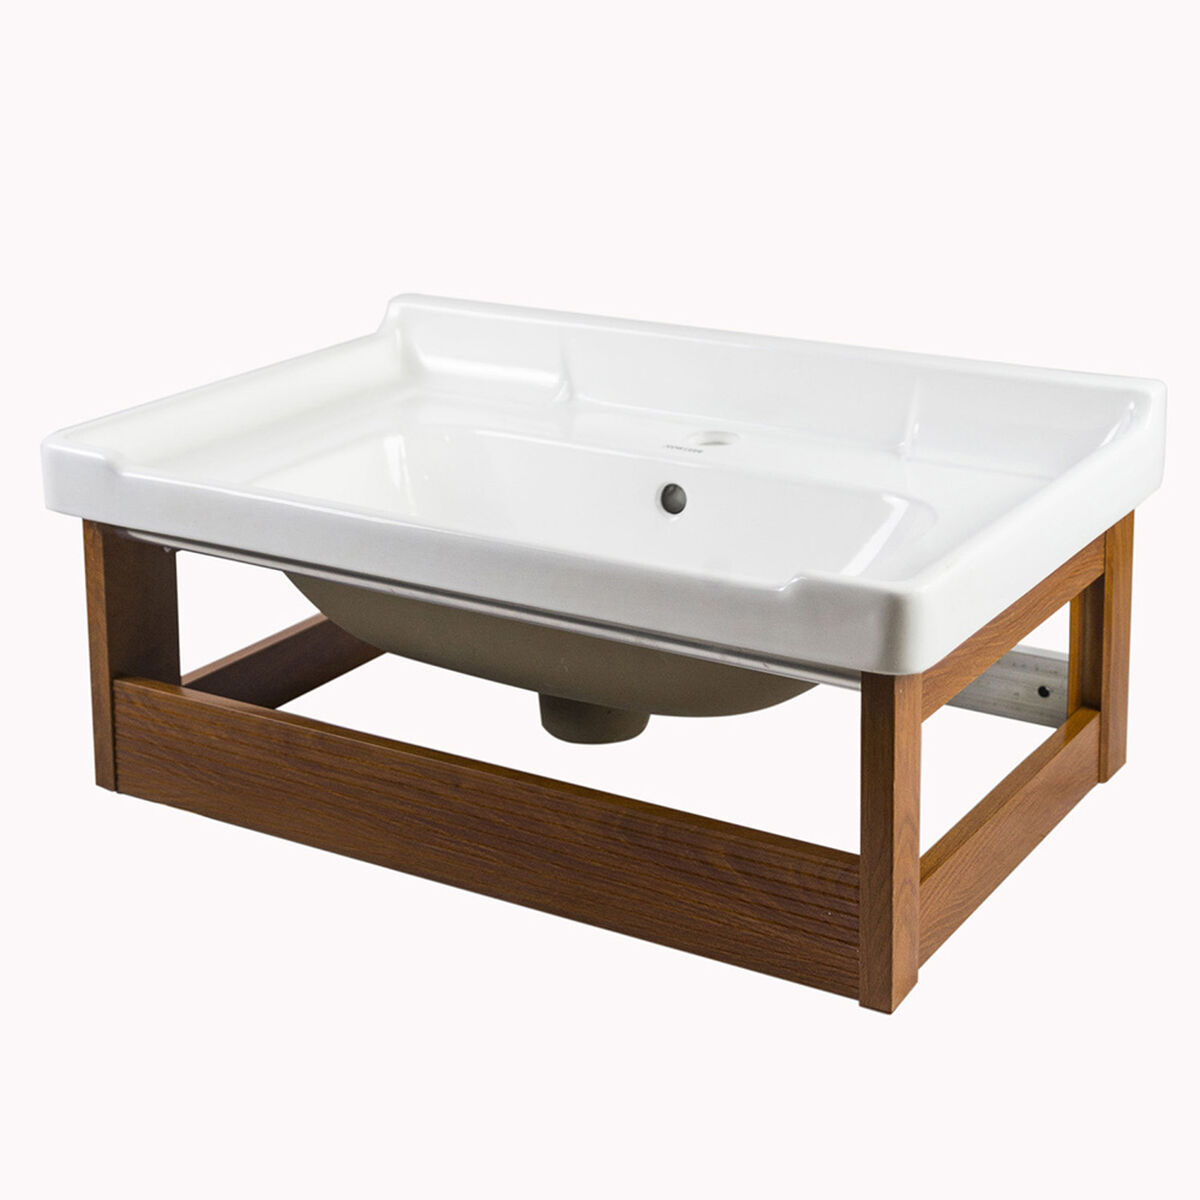 Mueble Vanitorio Britbox Coventry + Espejo + Lavamanos